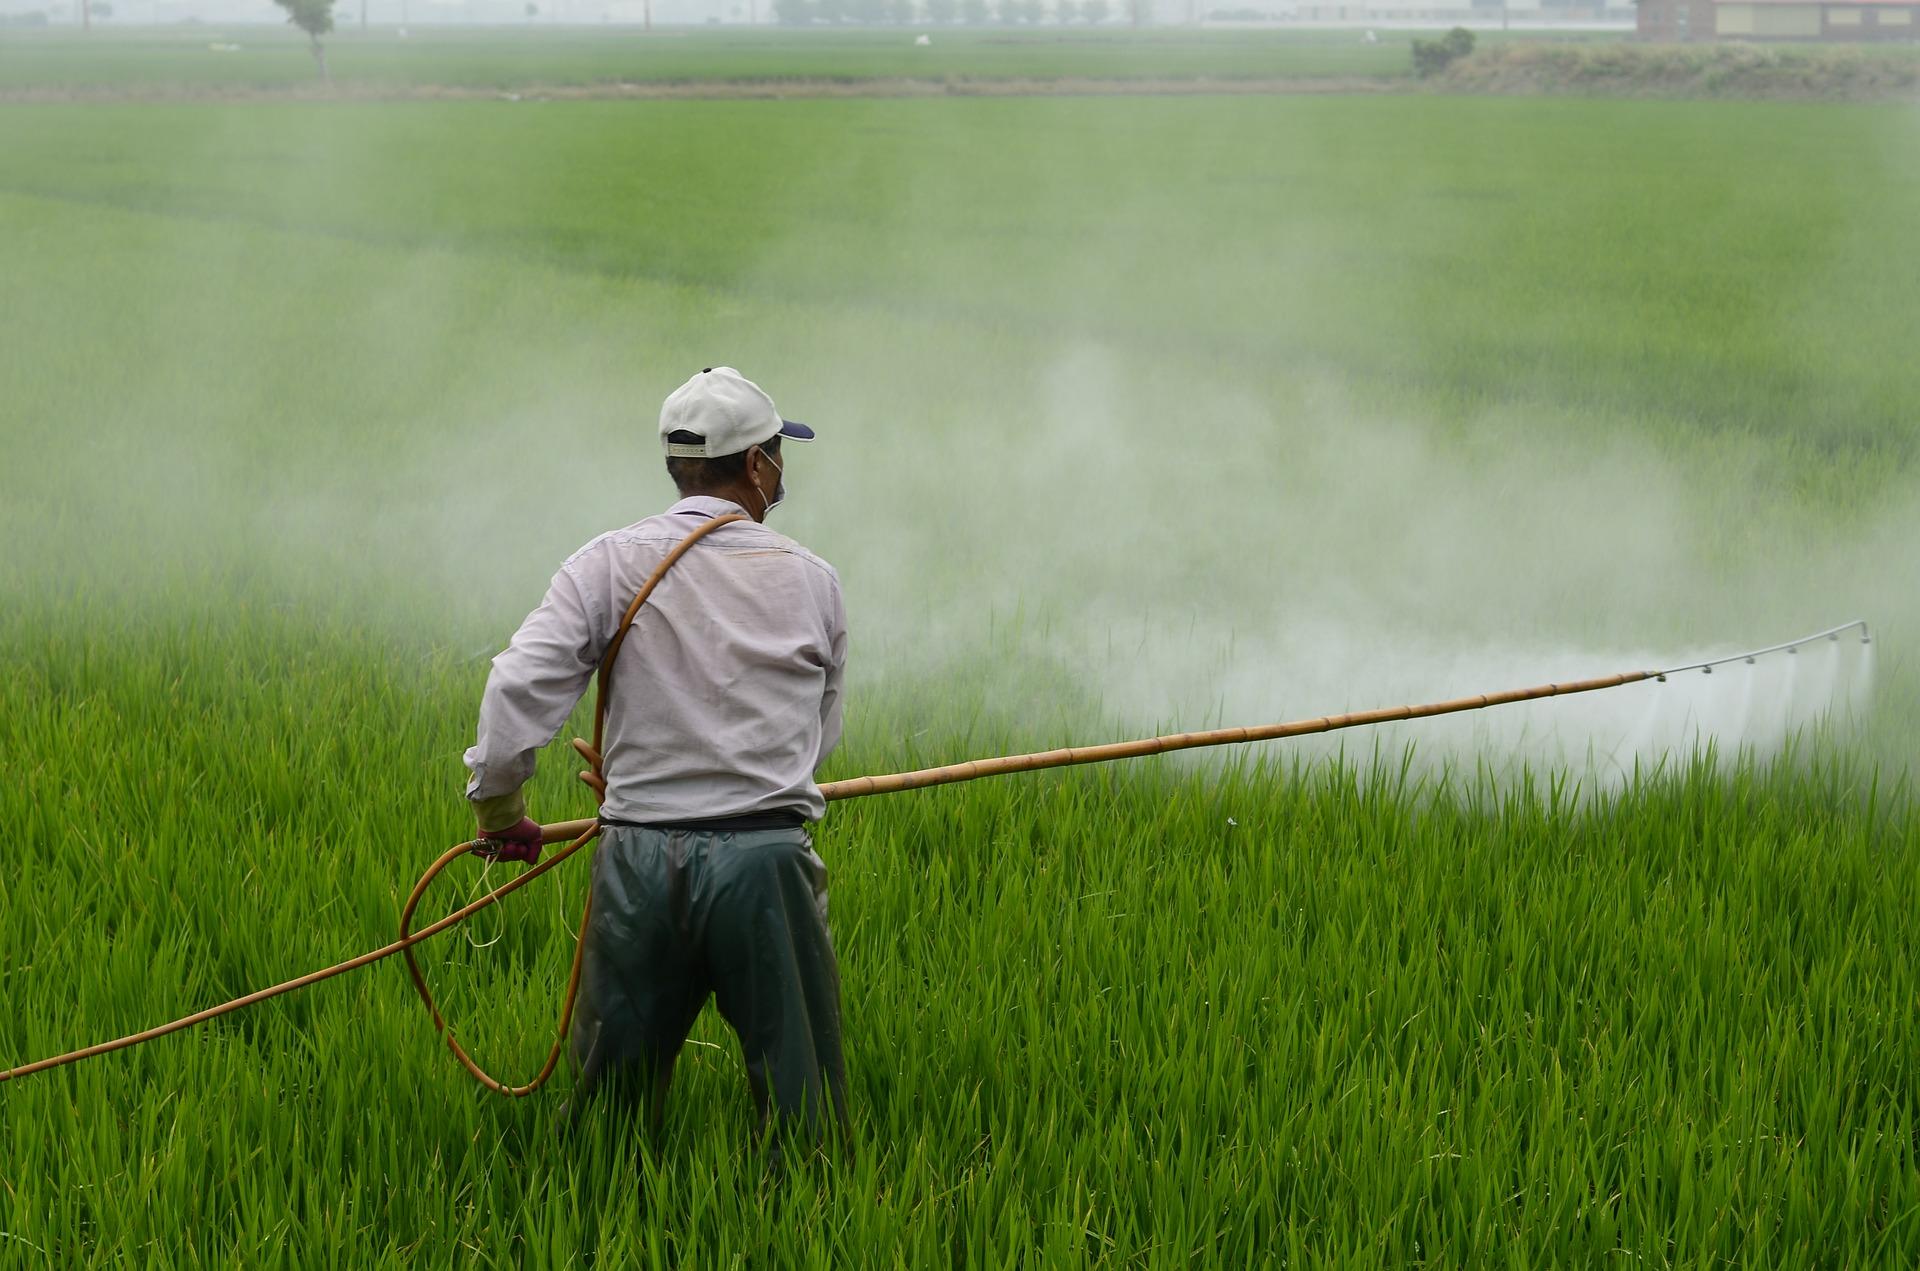 Mann sprüht Pestizide